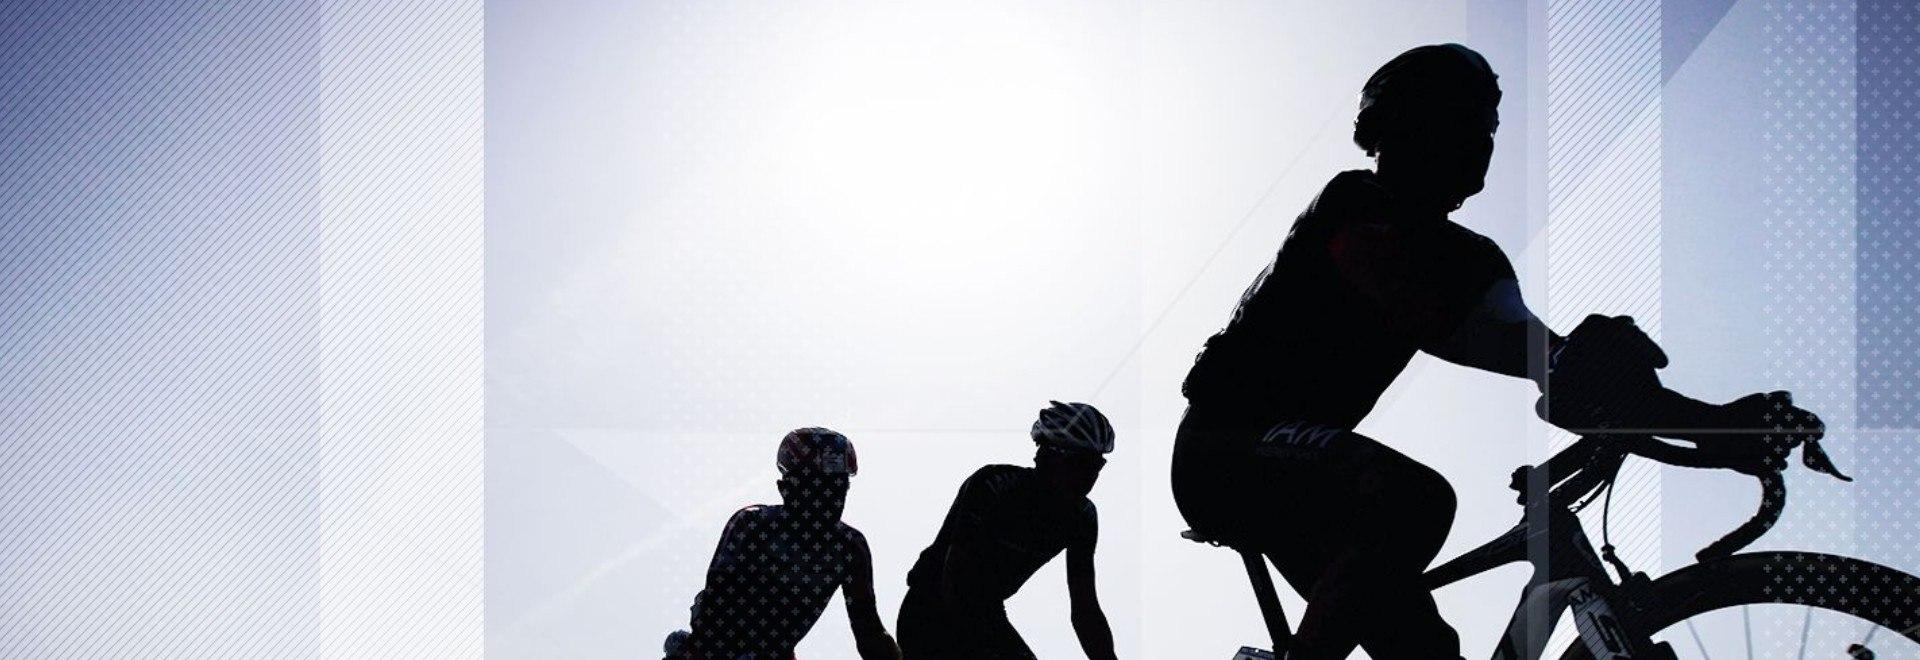 7a tappa. Vierzon - Le Creusot (248 km)